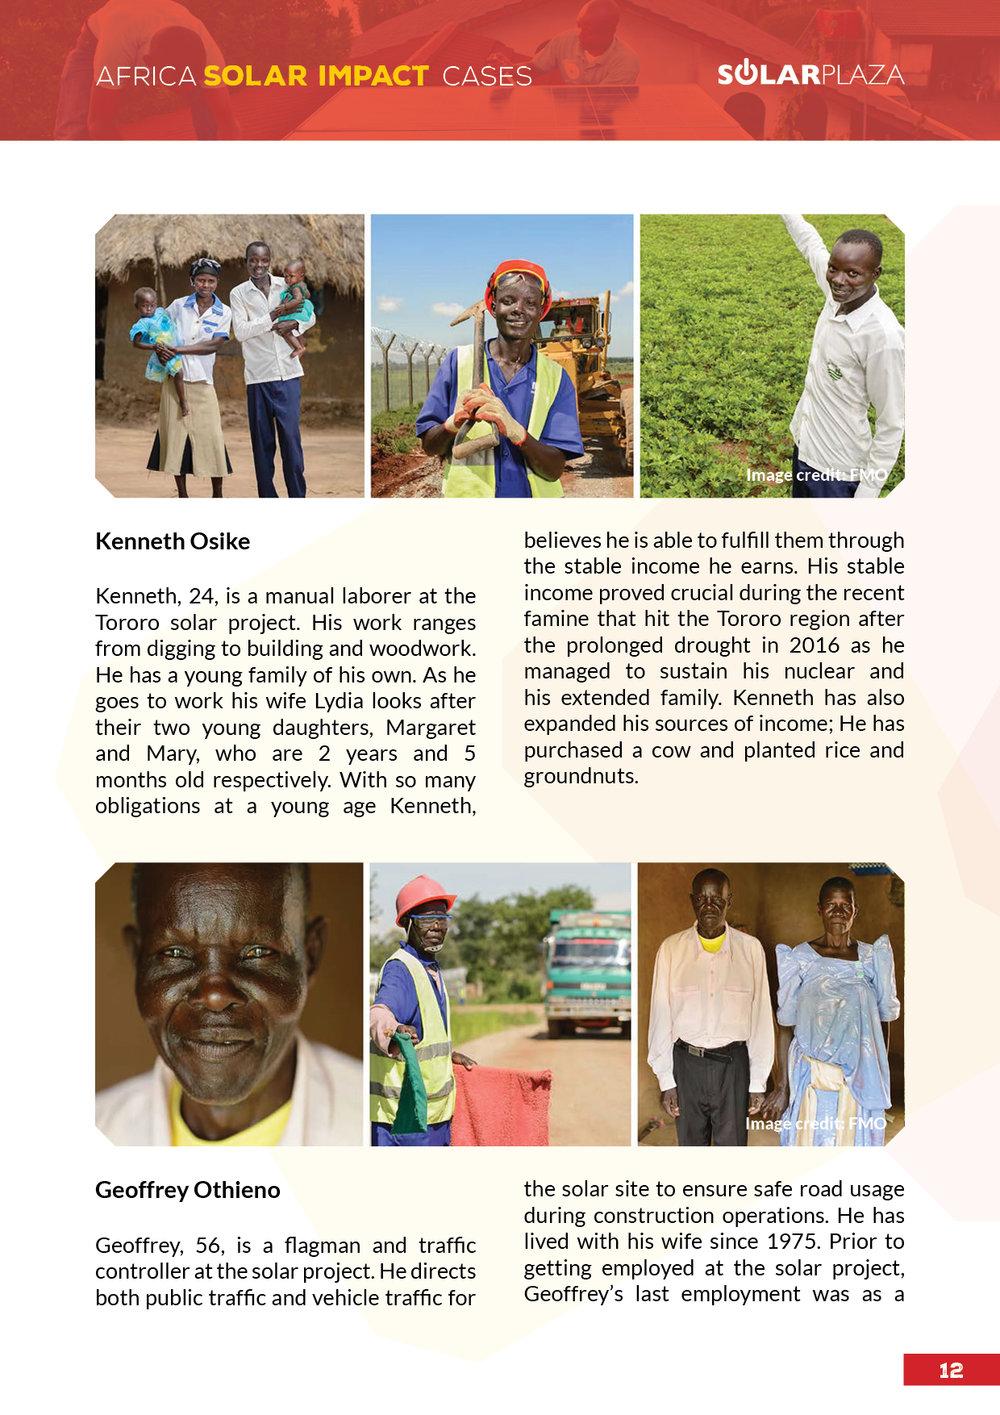 Africa Solar Impact Cases Report 1.0 (SRF)2 (2).jpg